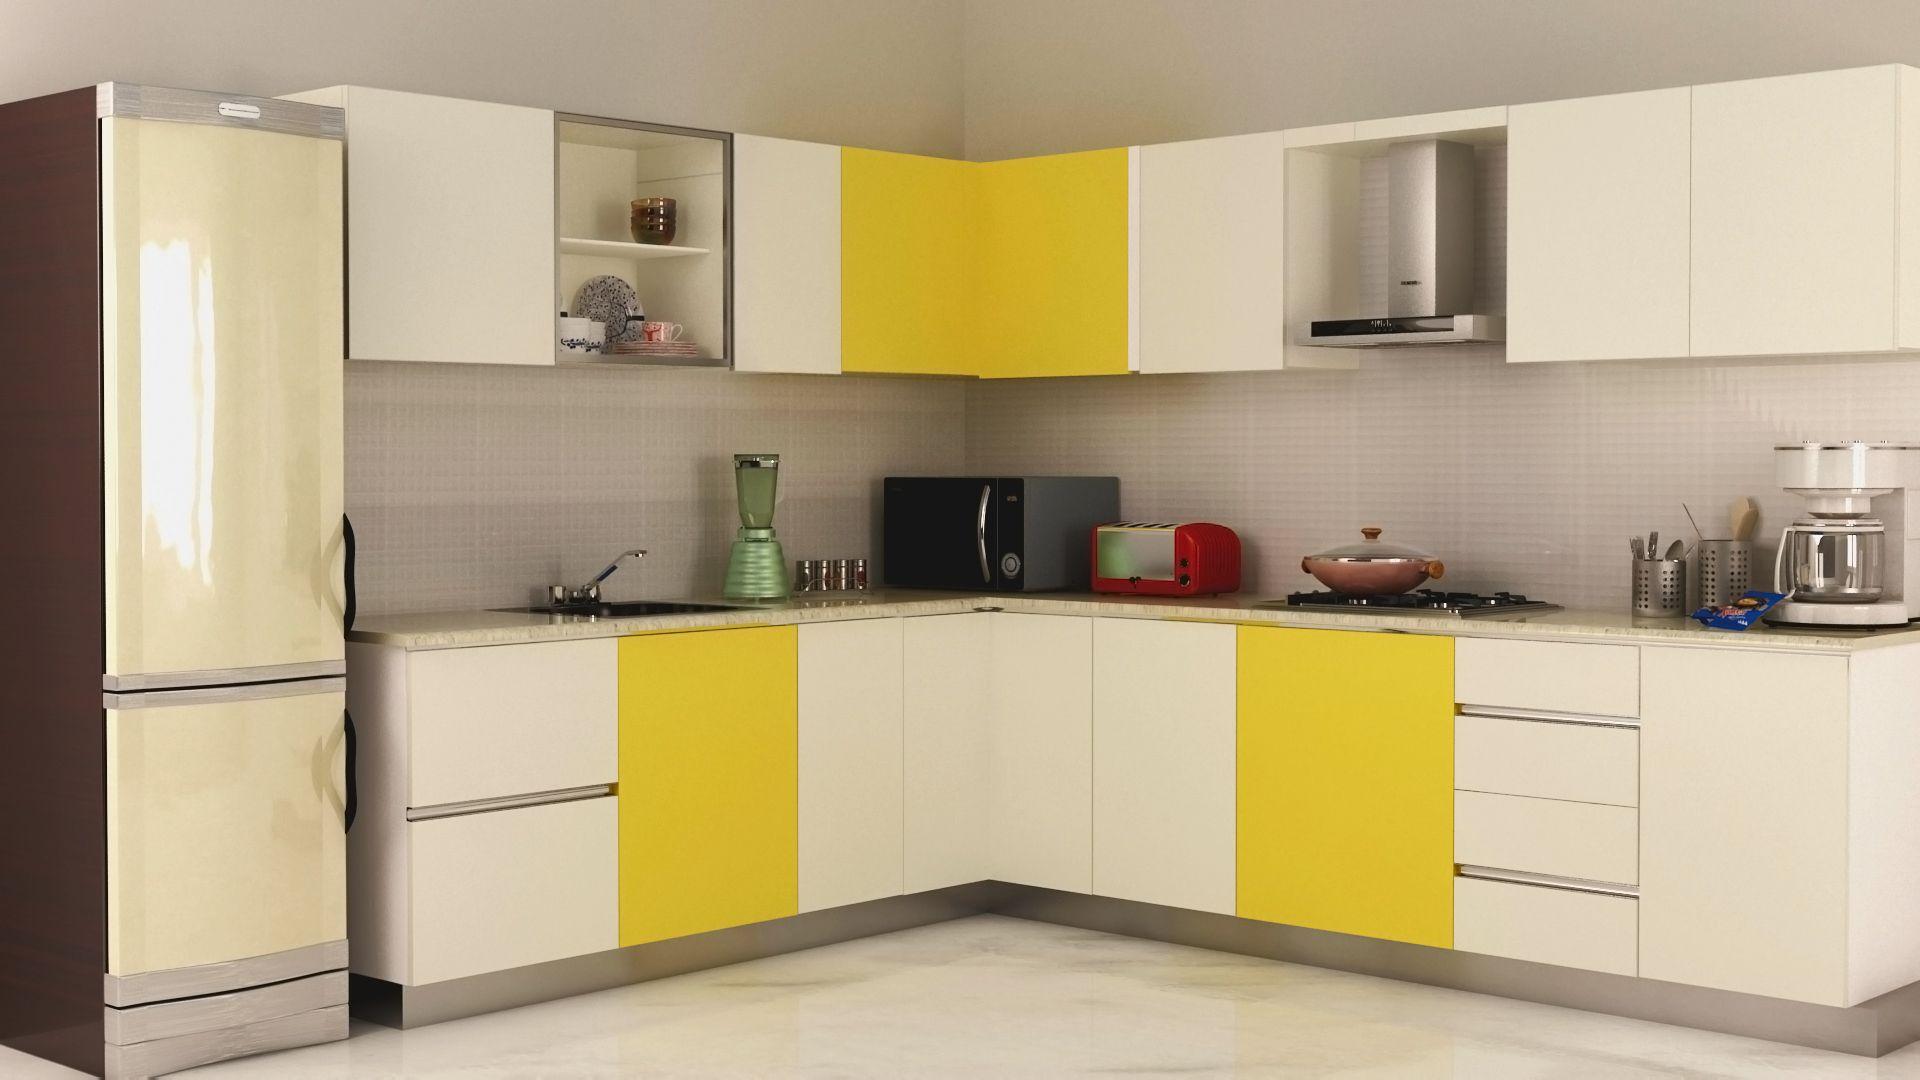 Kitchen l shaped modular kitchen white yellow cabinet island double door refrigerator green mixer single faucet